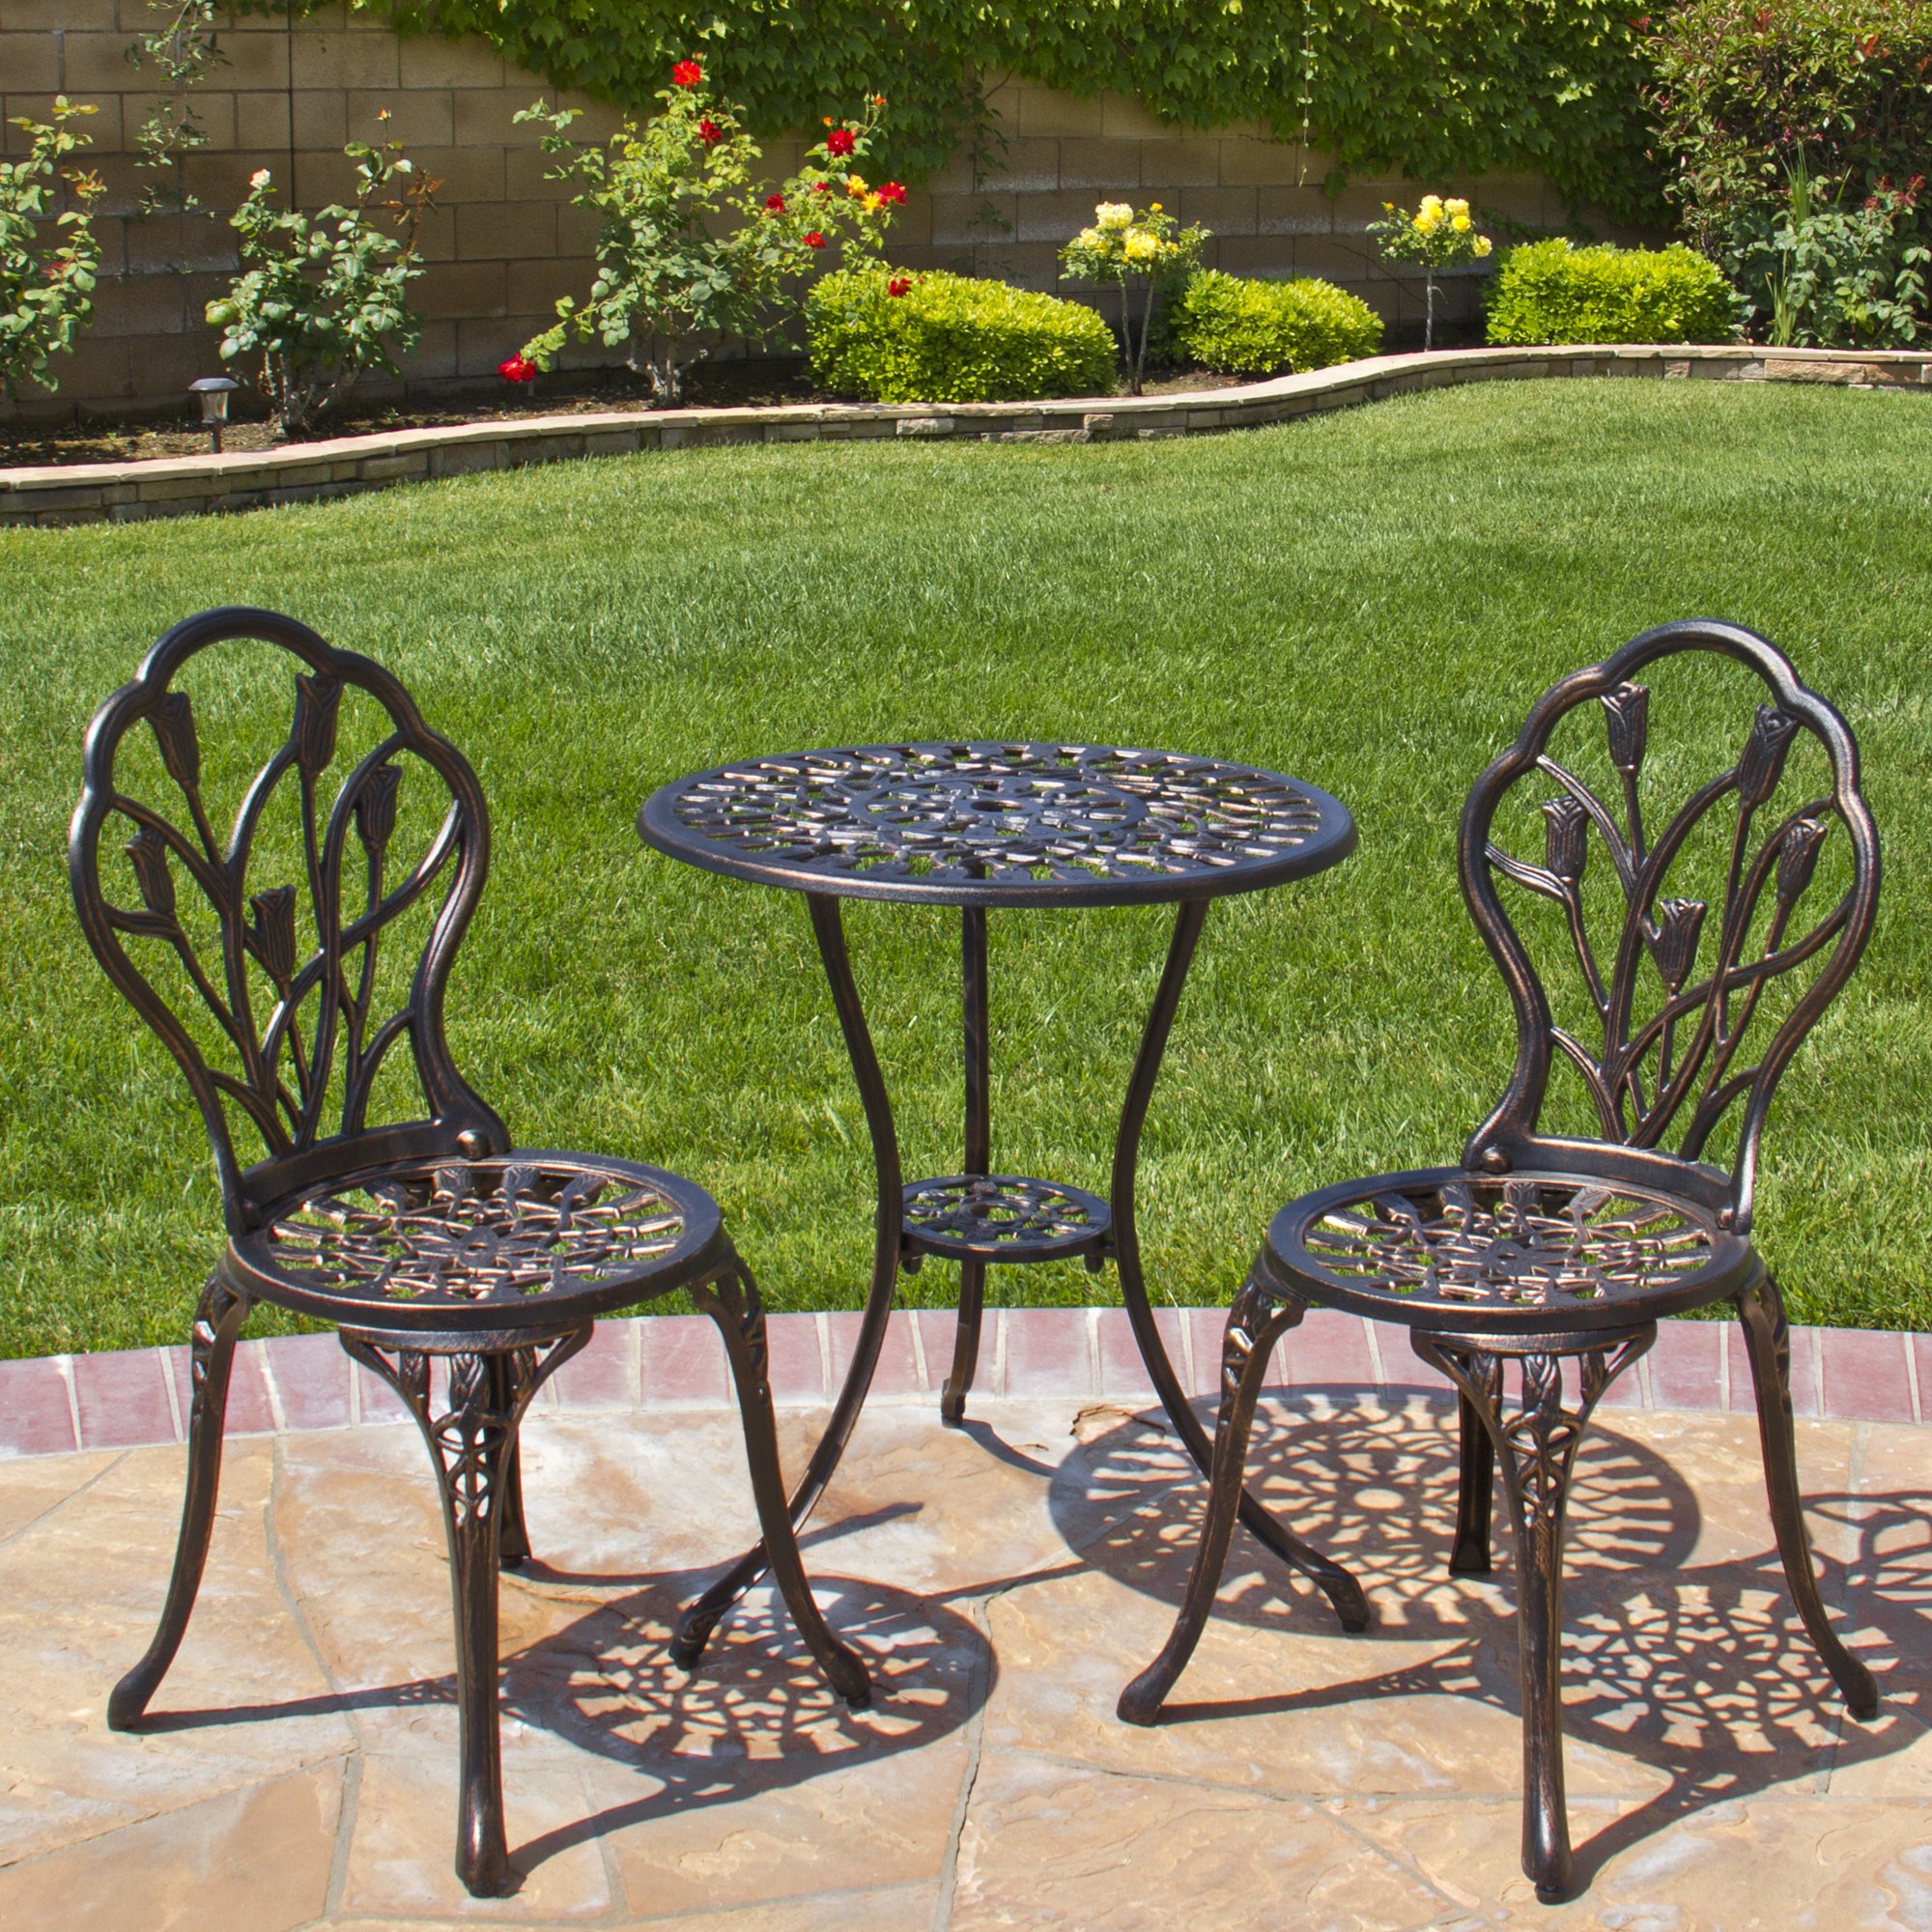 set metal furniture patio piece aluminum for new cast itm outdoor backyard garden